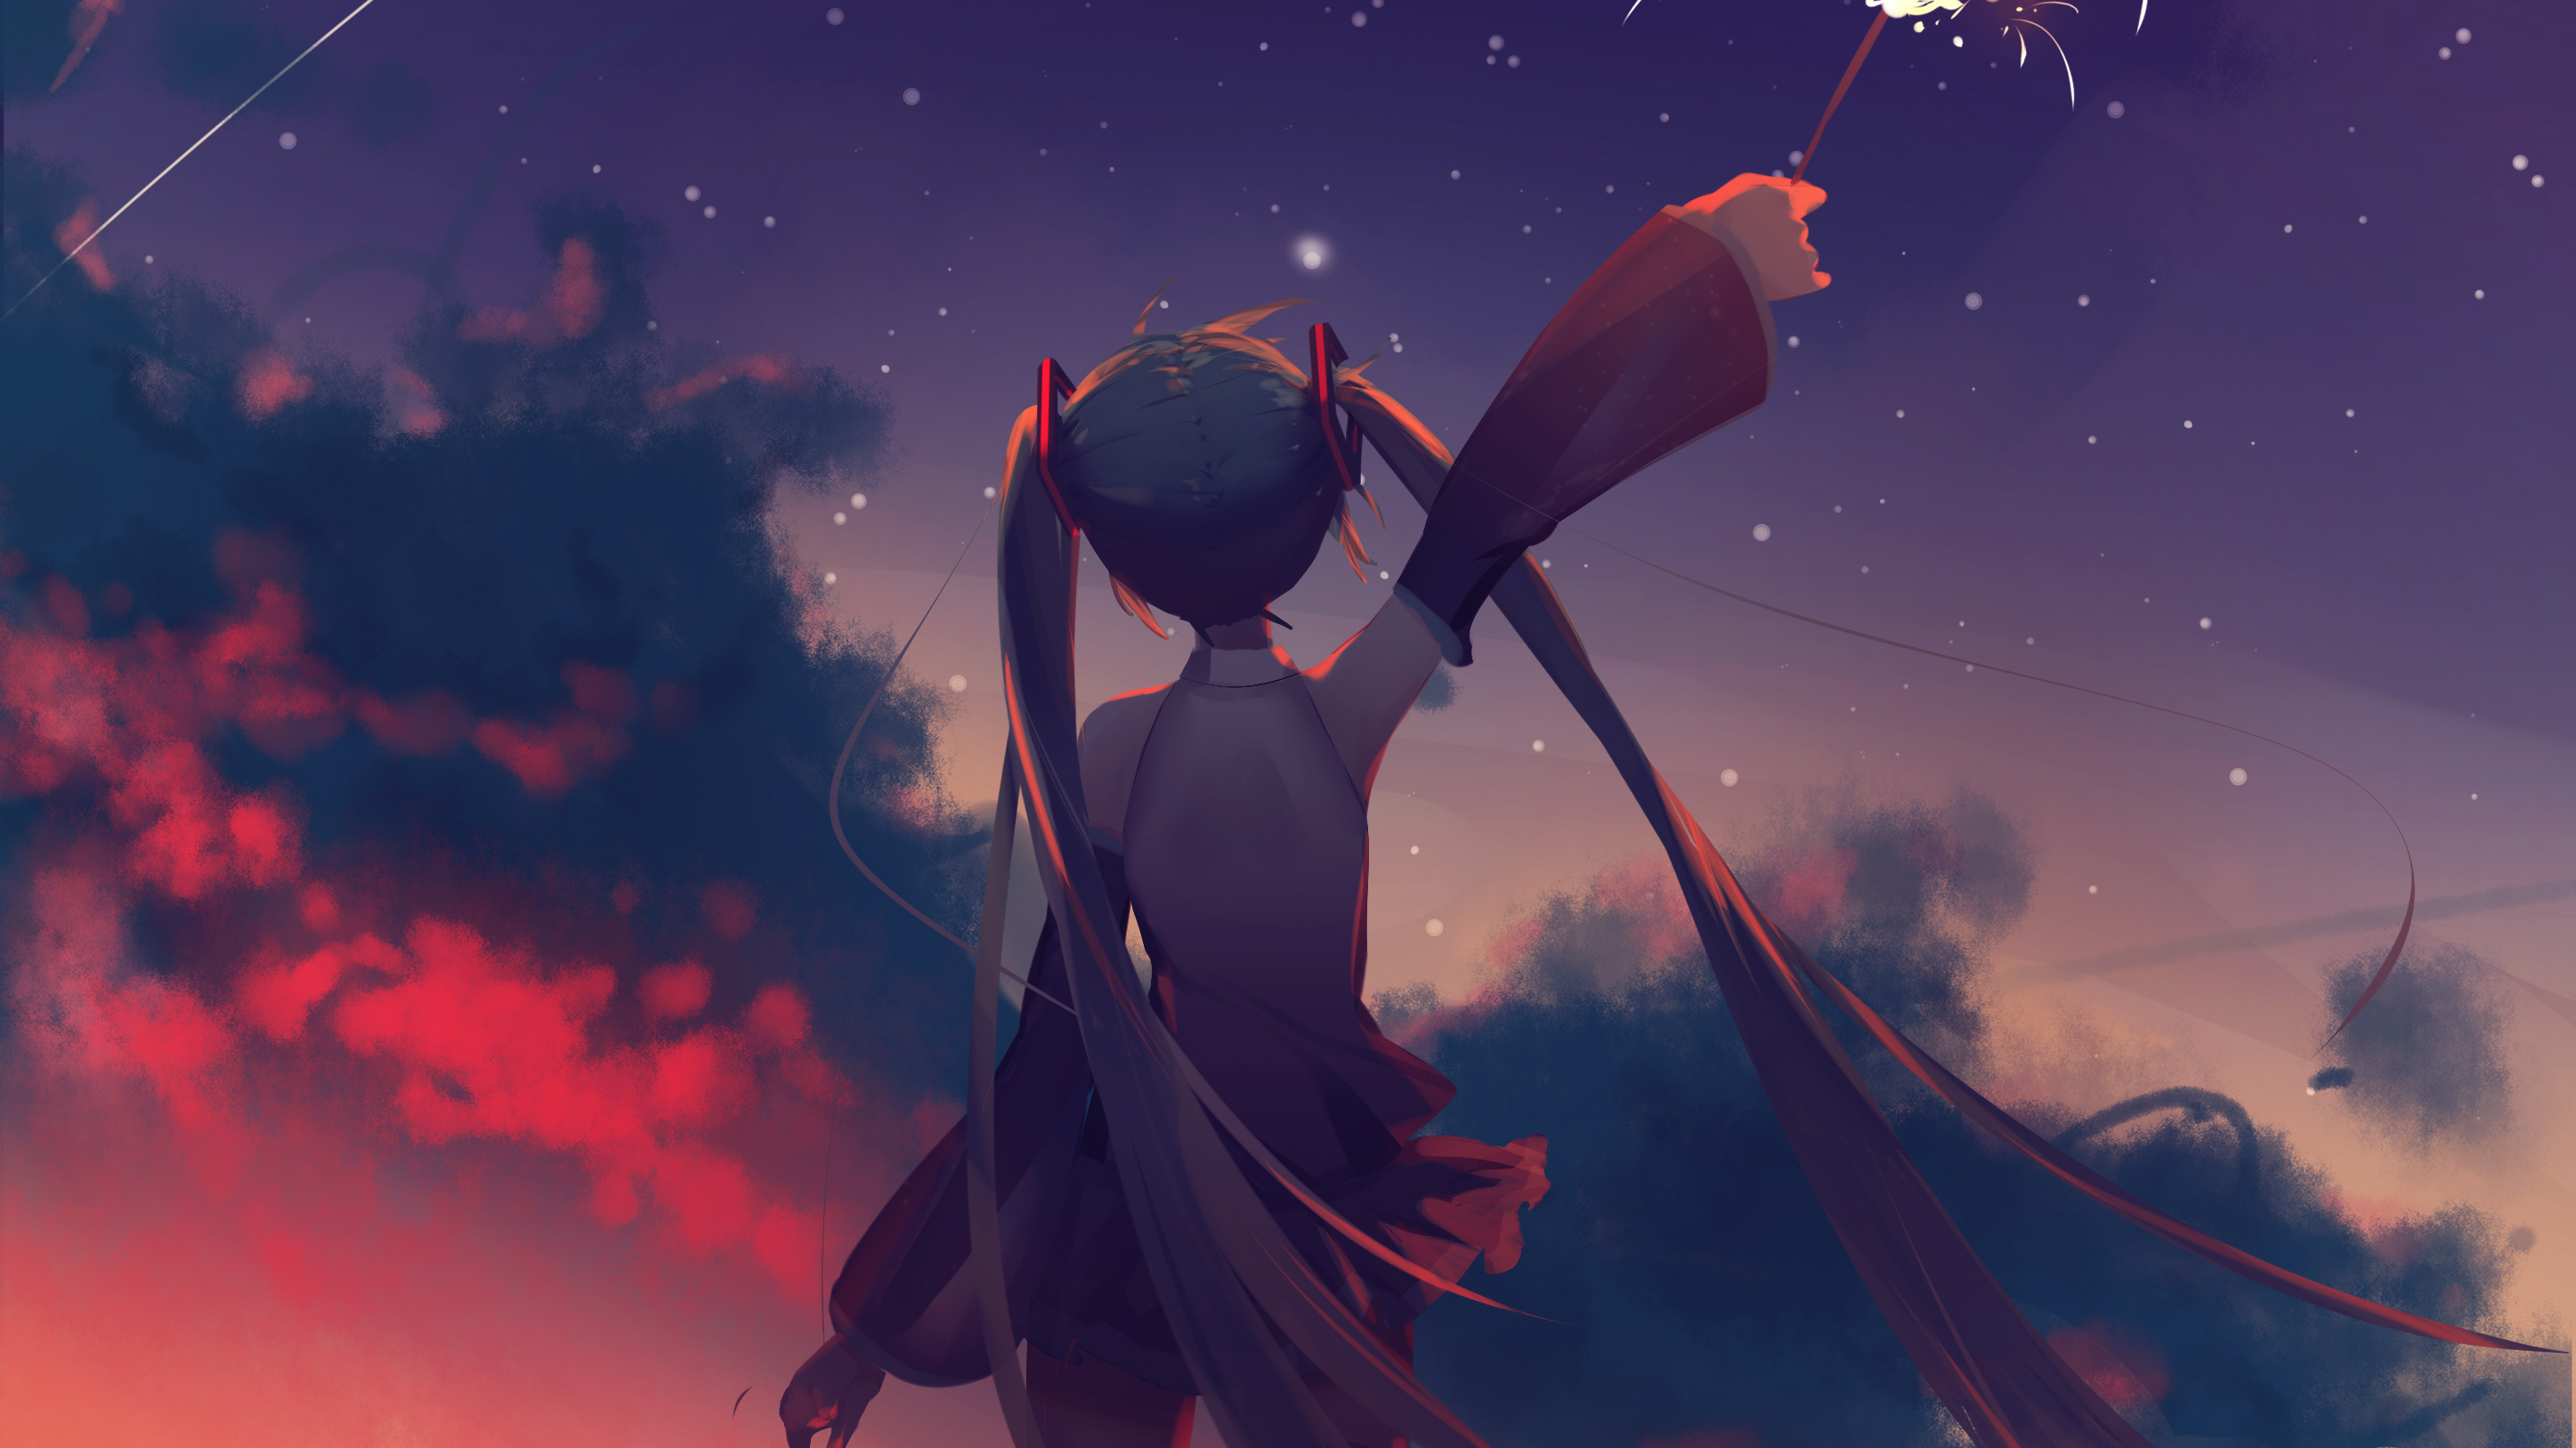 Fondos de pantalla Hatsune Miku Chica Anime